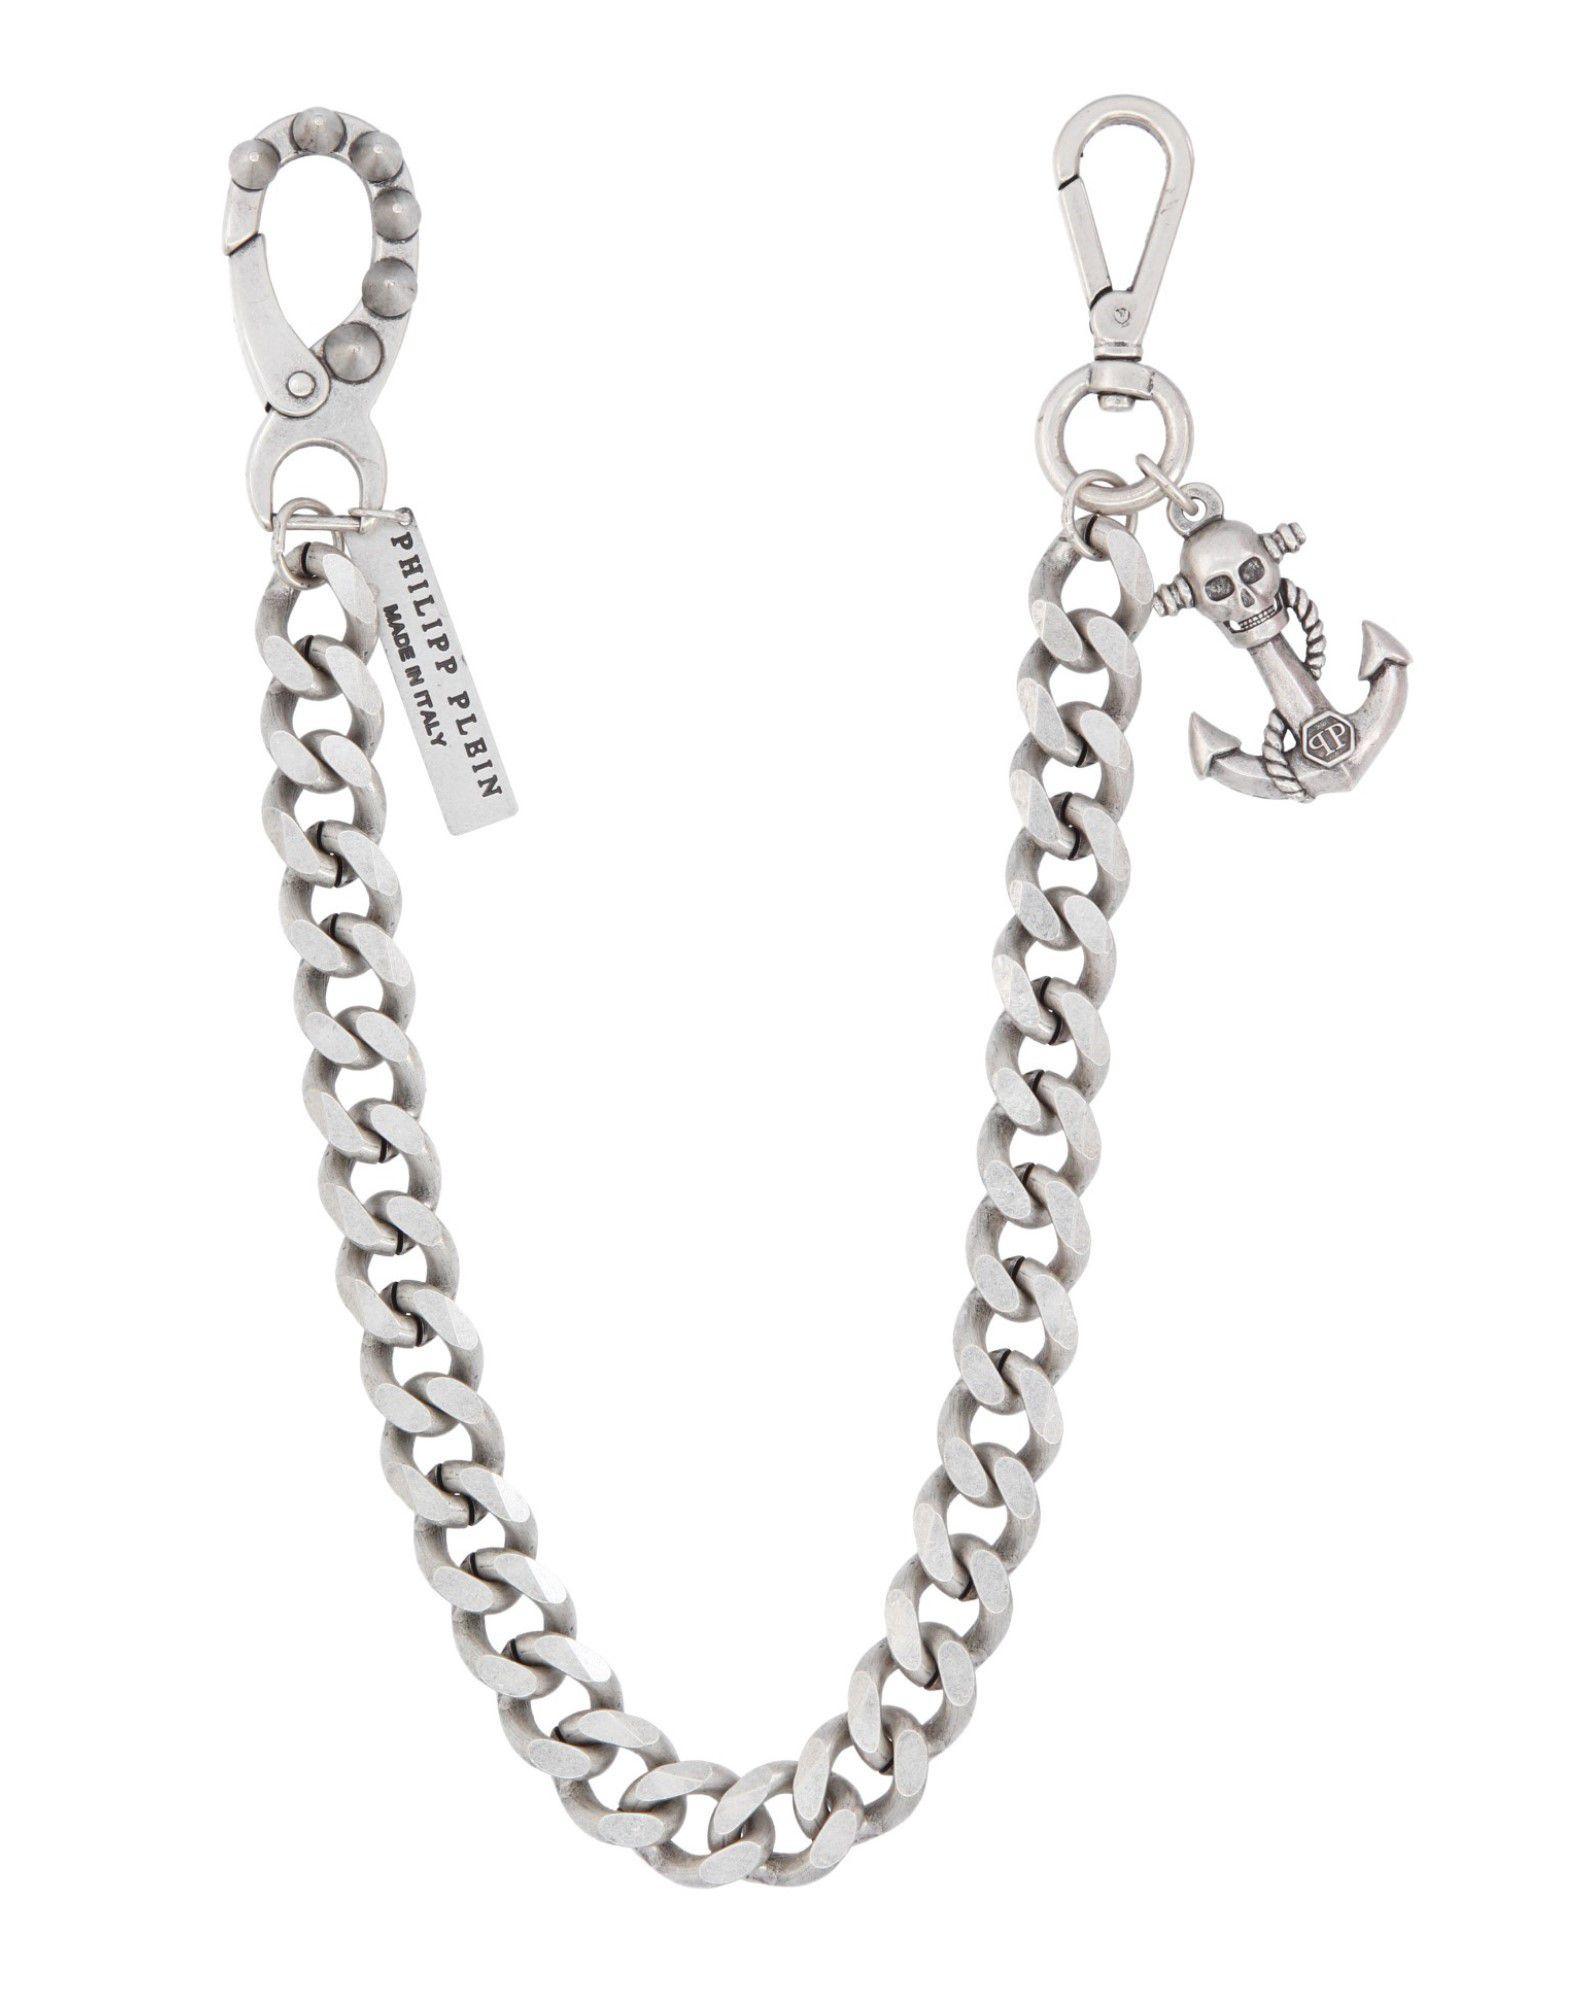 PHILIPP PLEIN Брелок для ключей брелок для ключей сердечко русские подарки брелок для ключей сердечко